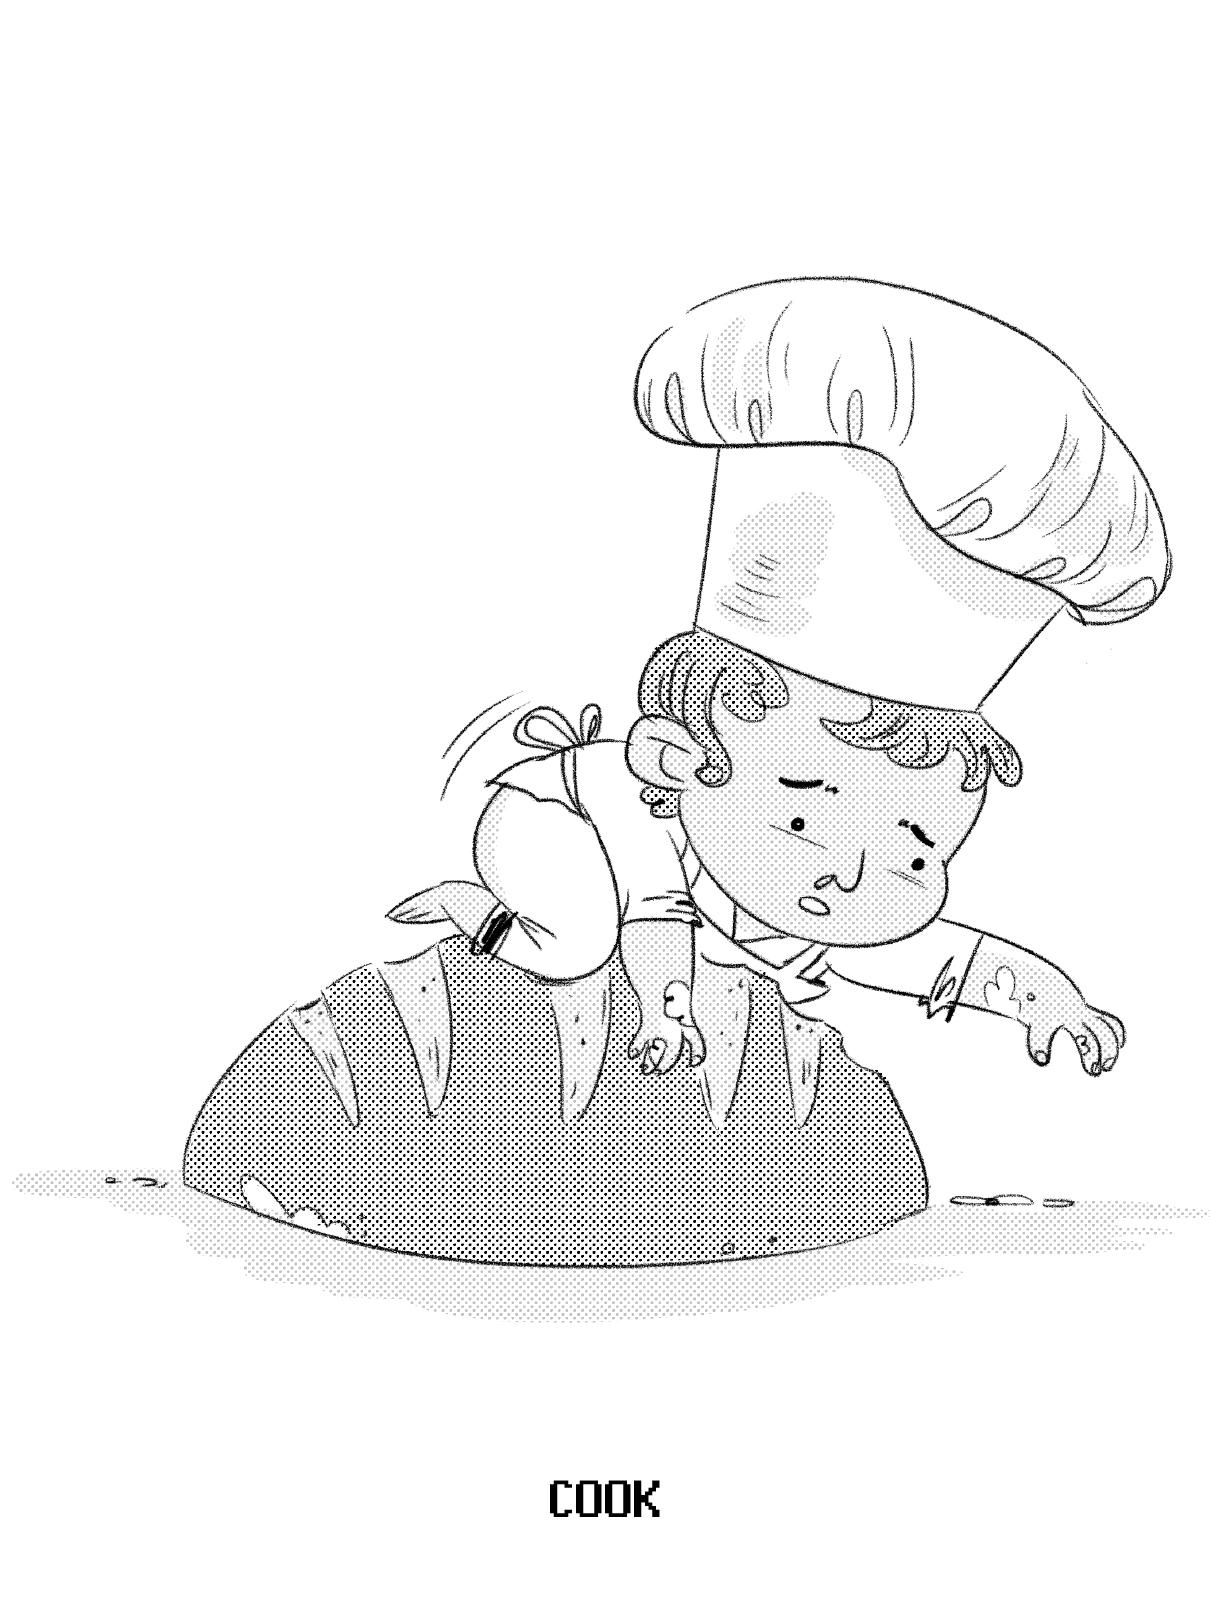 cook_named.jpg